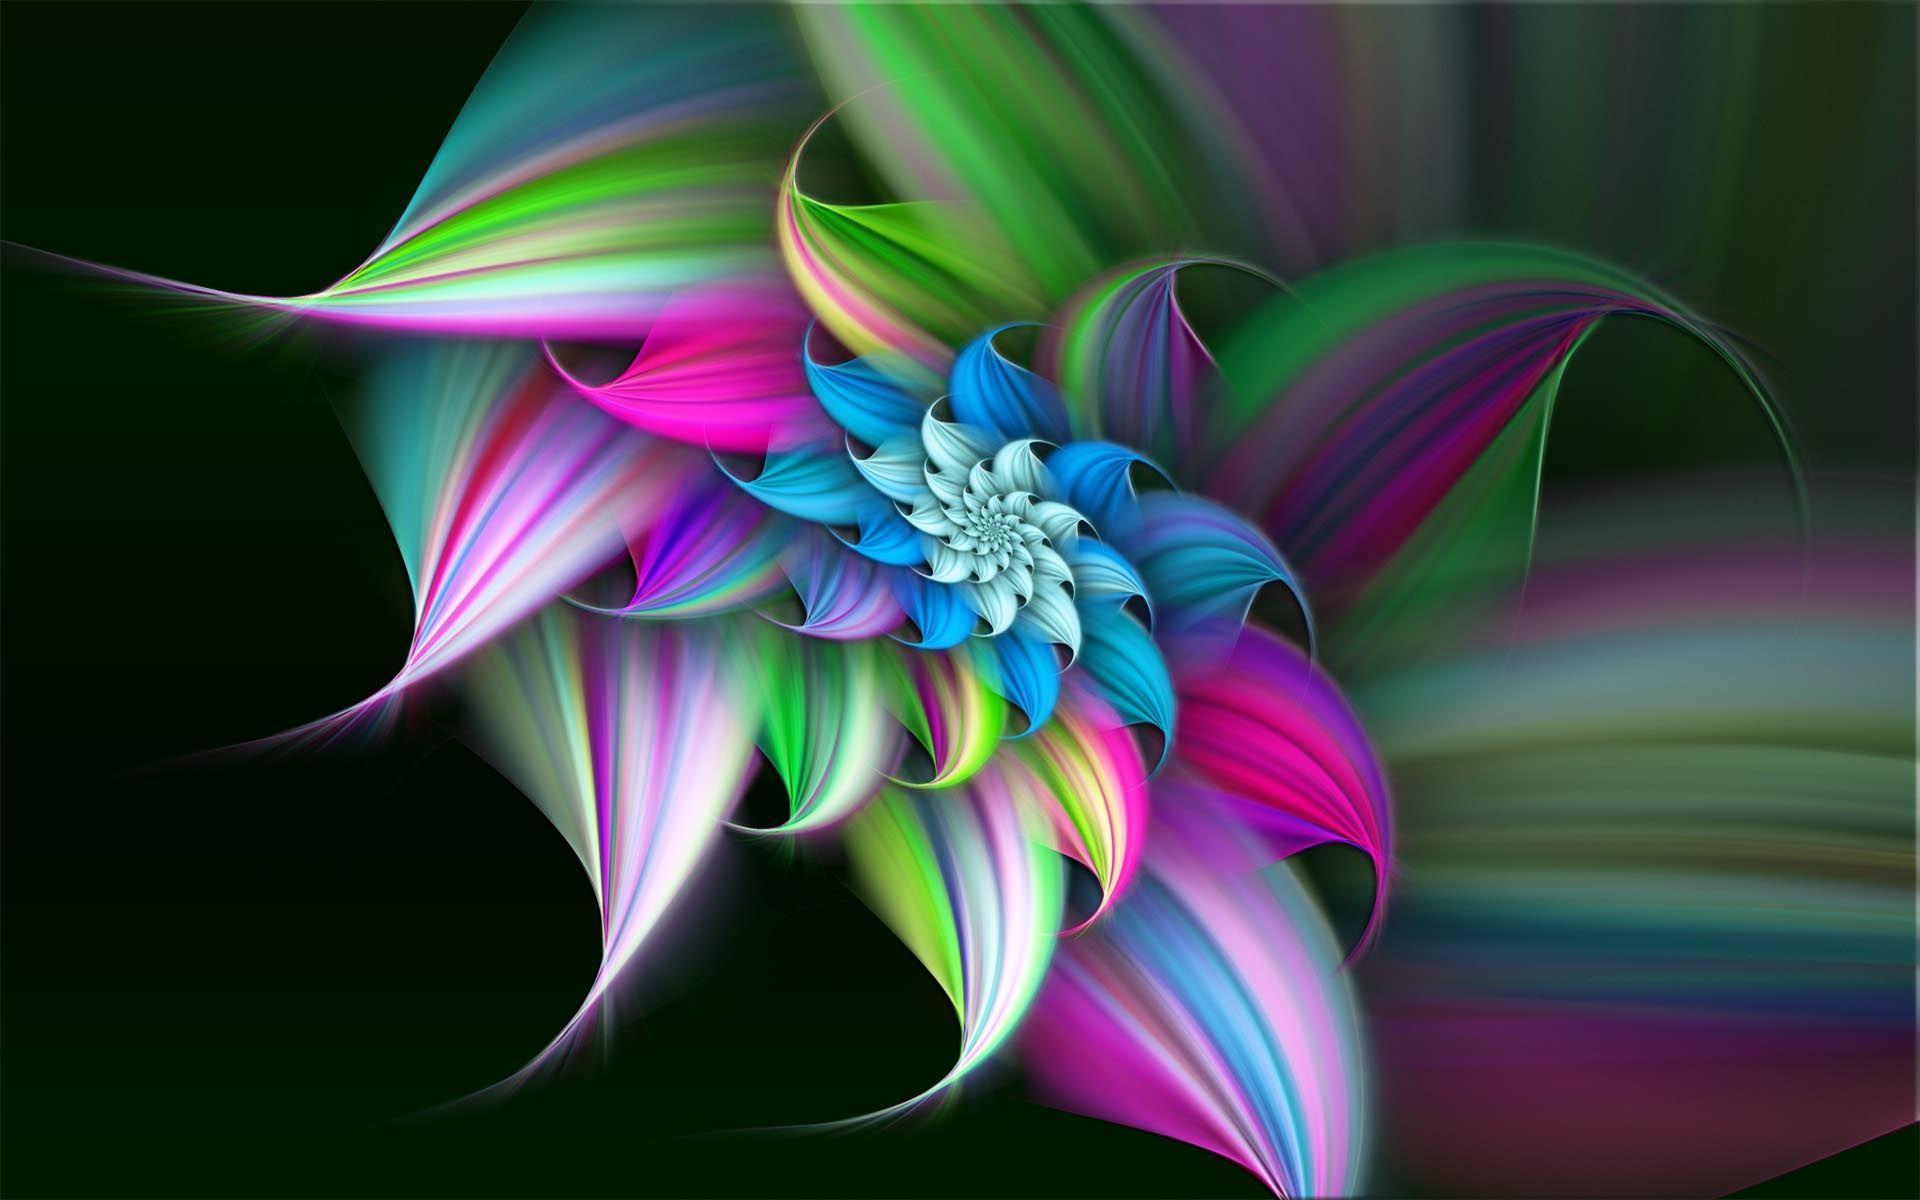 Summer Flower Art Desktop Background In High Quality Resolutions